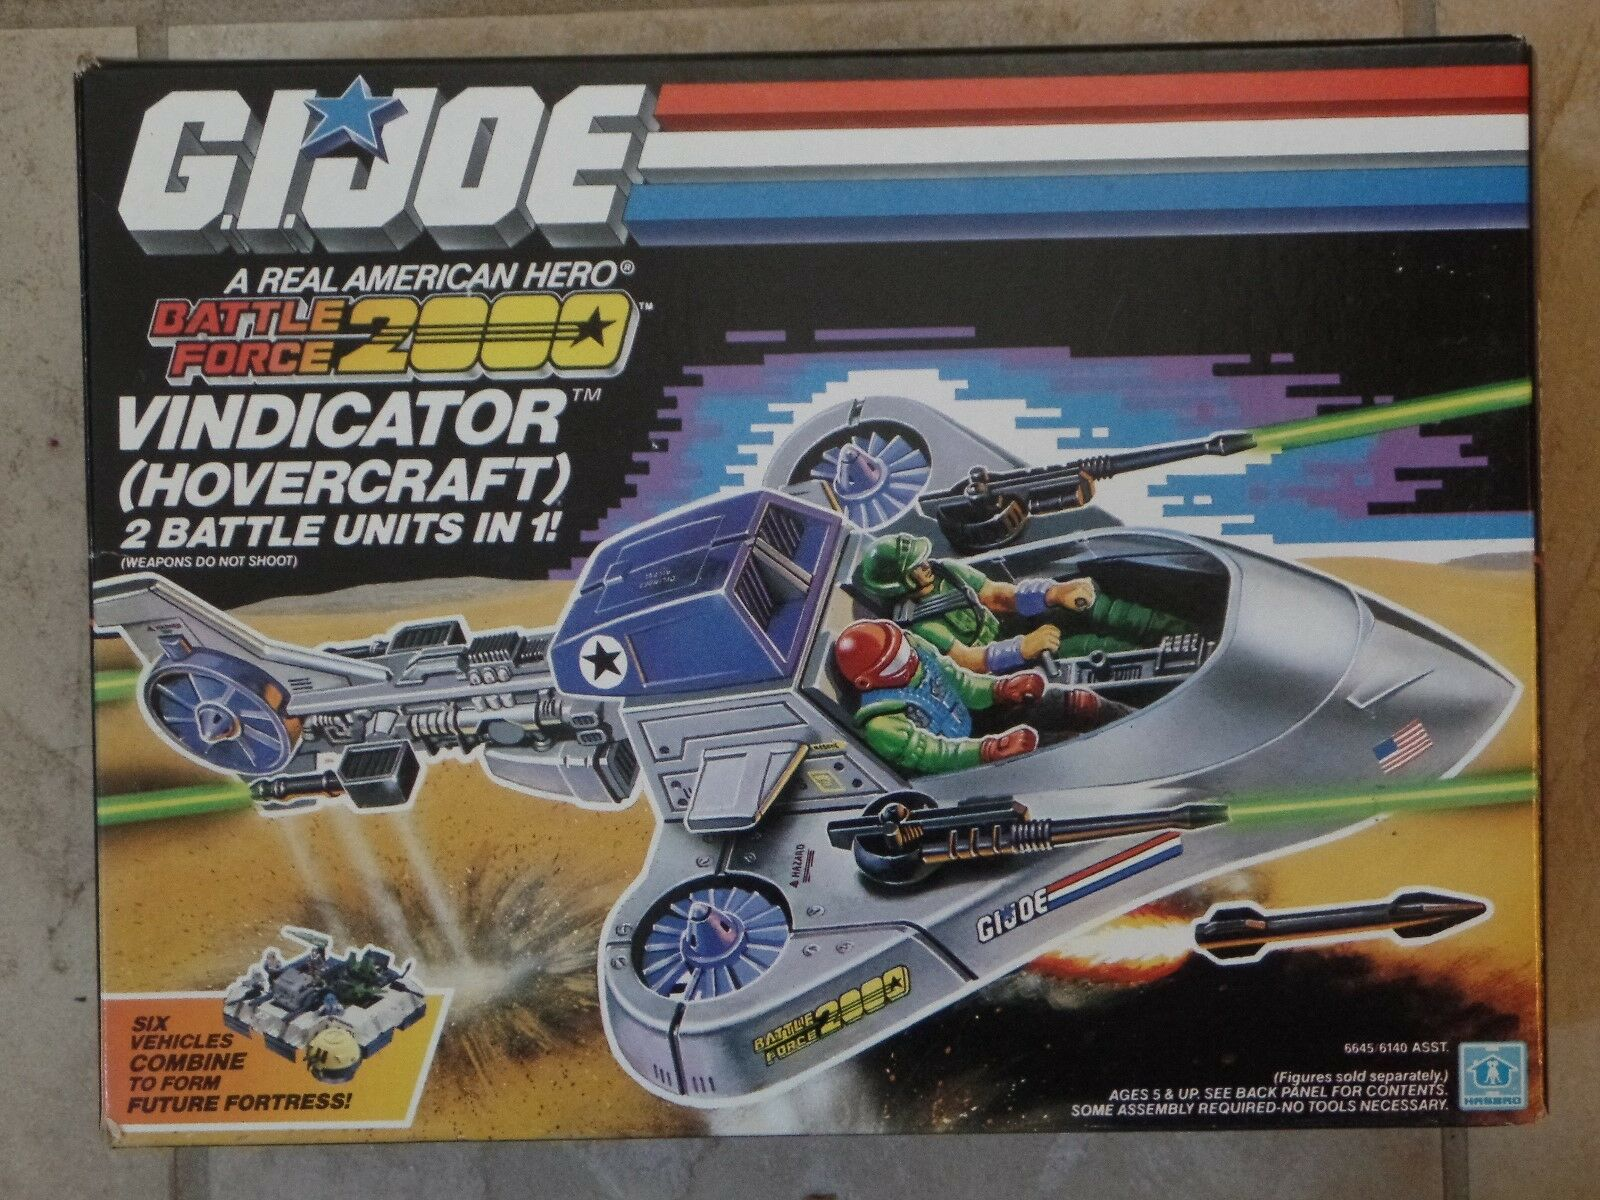 GI Joe Battle Force 2000 VINDICATOR HOVERCRAFT Hasbro 1987 New SEALED MISB RARE